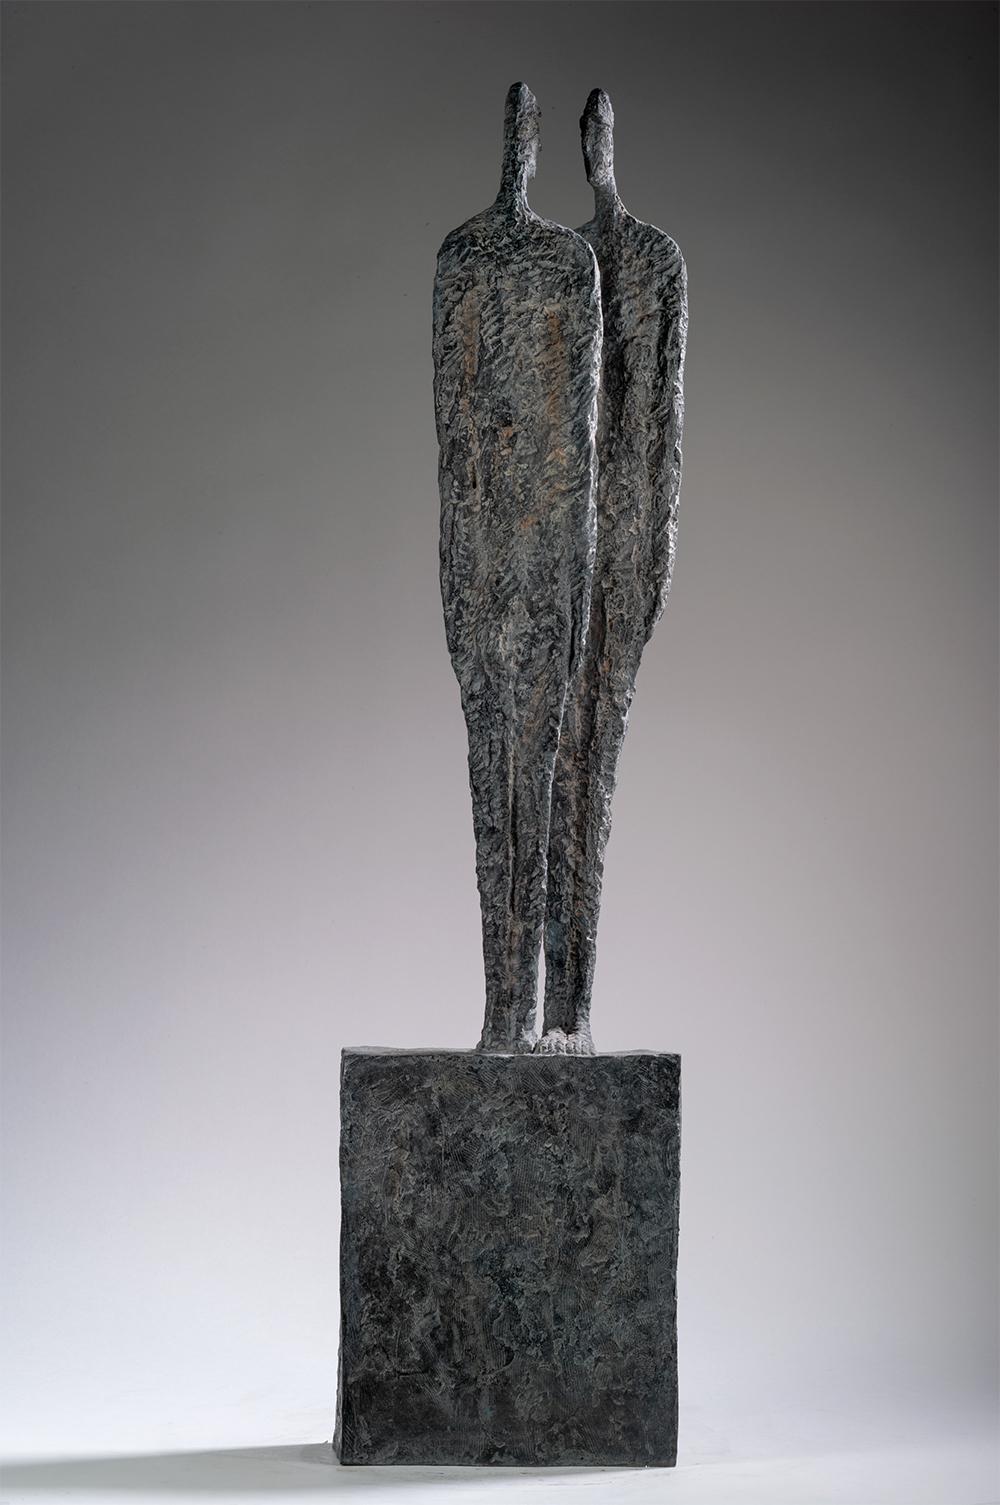 The Great Secret by Martine Demal - Contemporary bronze sculpture, human figure